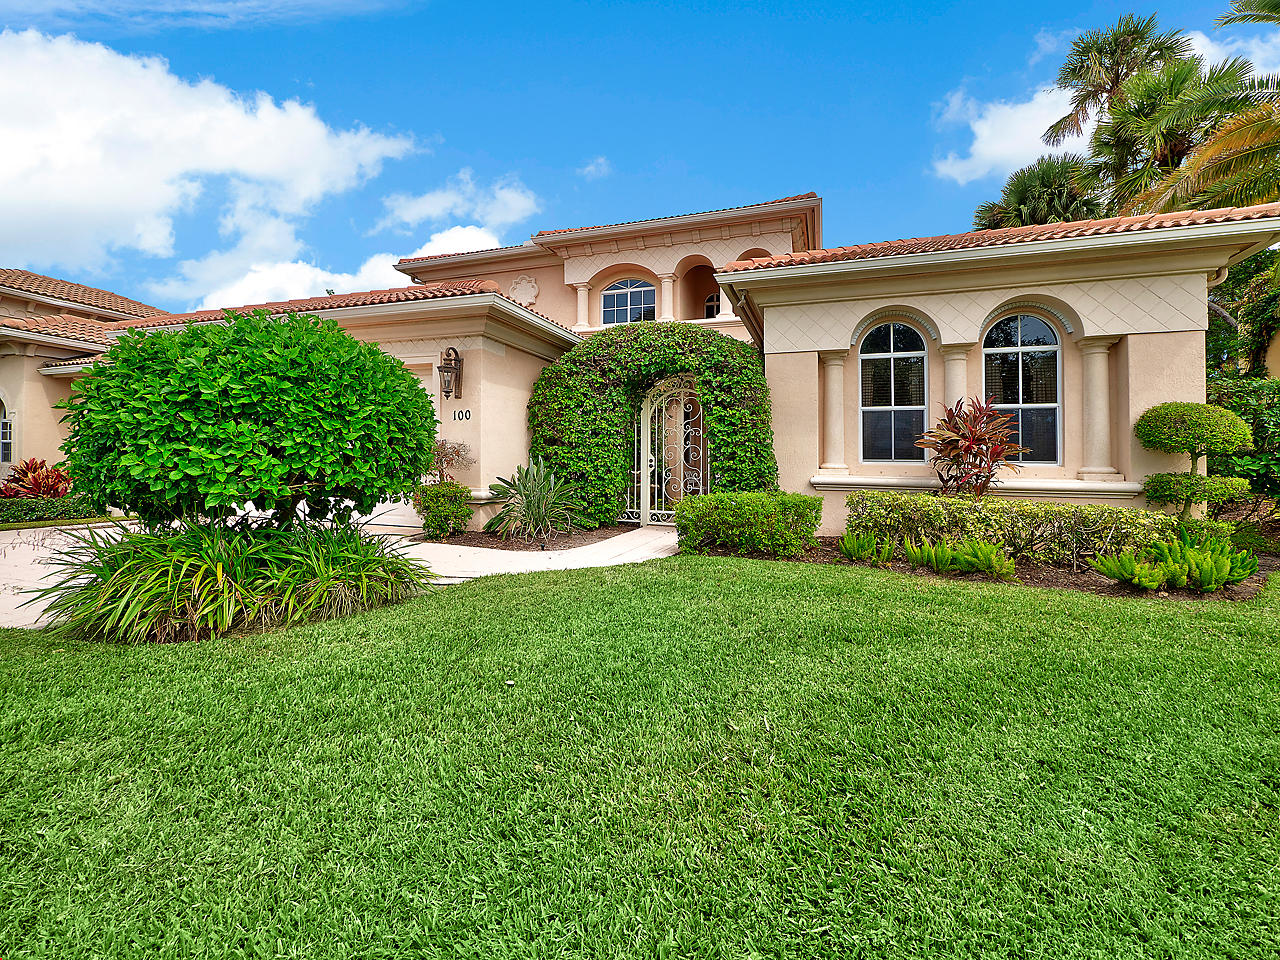 100 Abondance Drive, Palm Beach Gardens, Florida 33410, 3 Bedrooms Bedrooms, ,4.1 BathroomsBathrooms,A,Single family,Abondance,RX-10513479